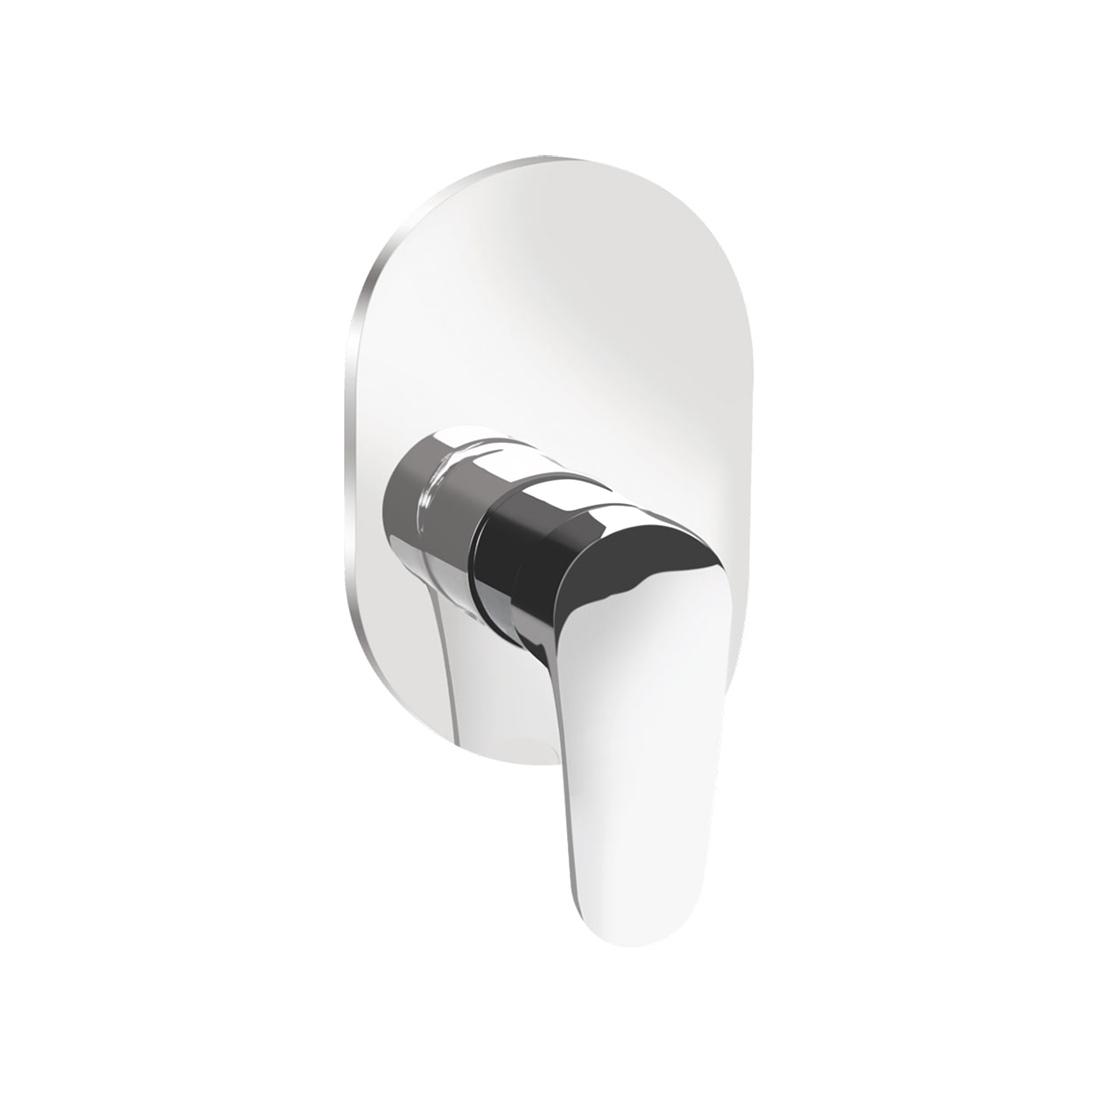 Kerovit Hydrus KB411015 Single Lever 2-Inlet Concealed Shower Mixer Trim